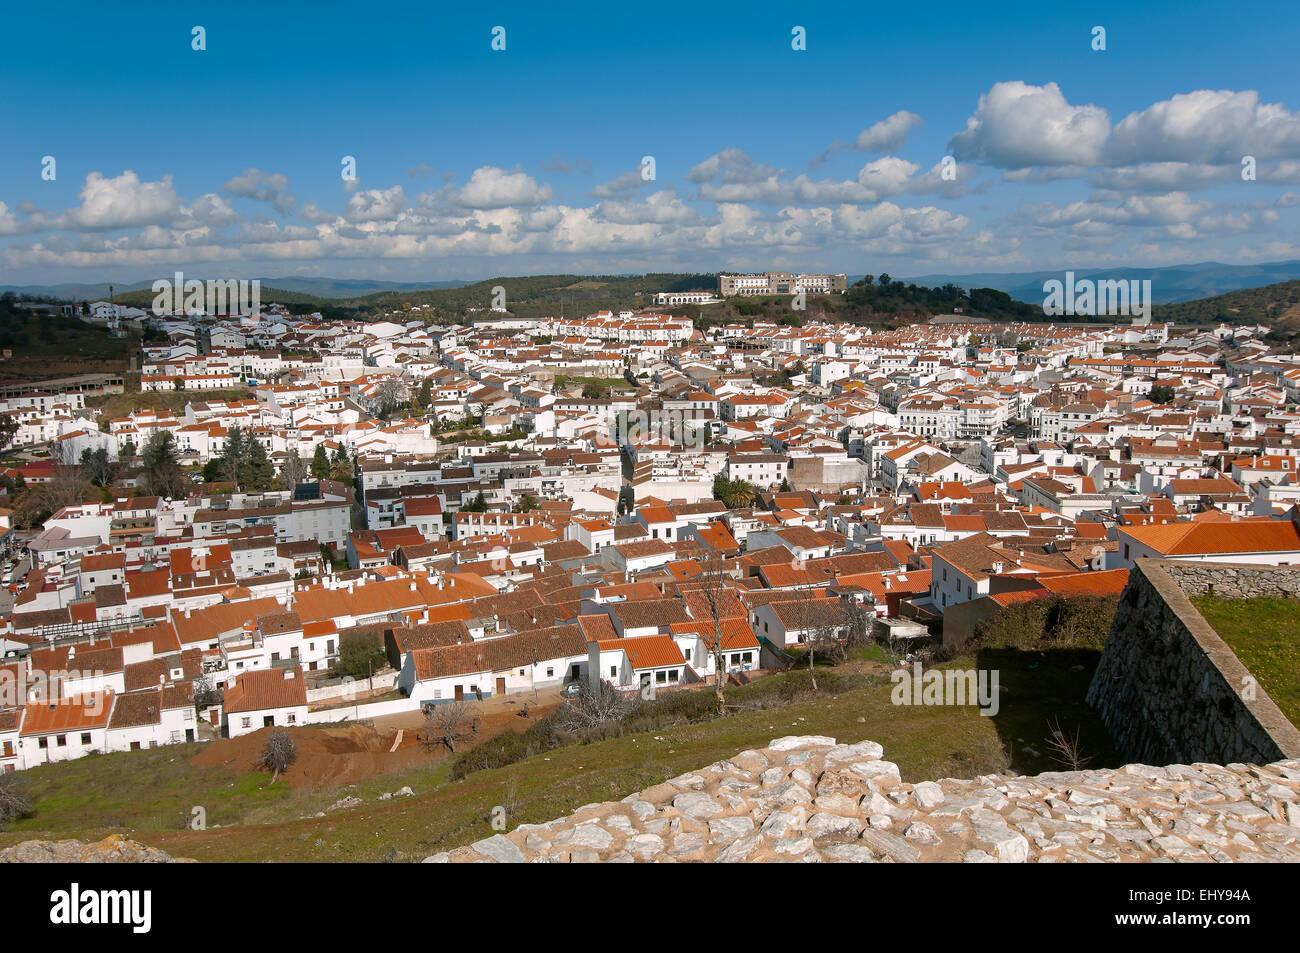 Panoramic view, Aracena, Huelva province, Region of Andalusia, Spain, Europe - Stock Image